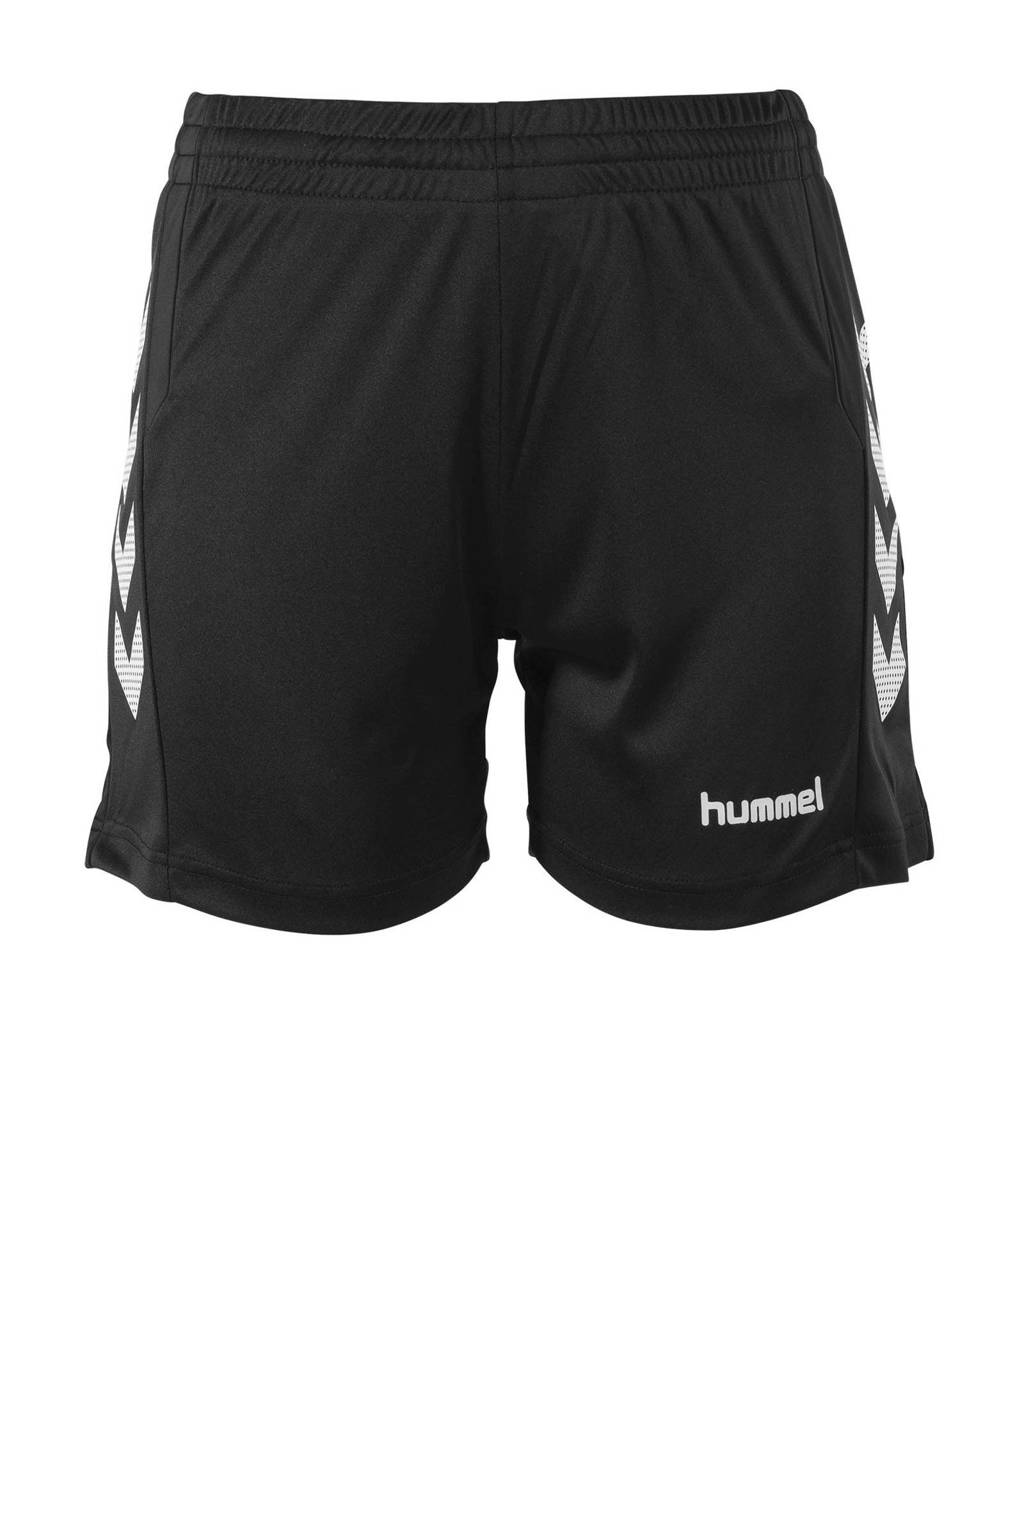 hummel sportshort Aarhus zwart/wit, Zwart/wit